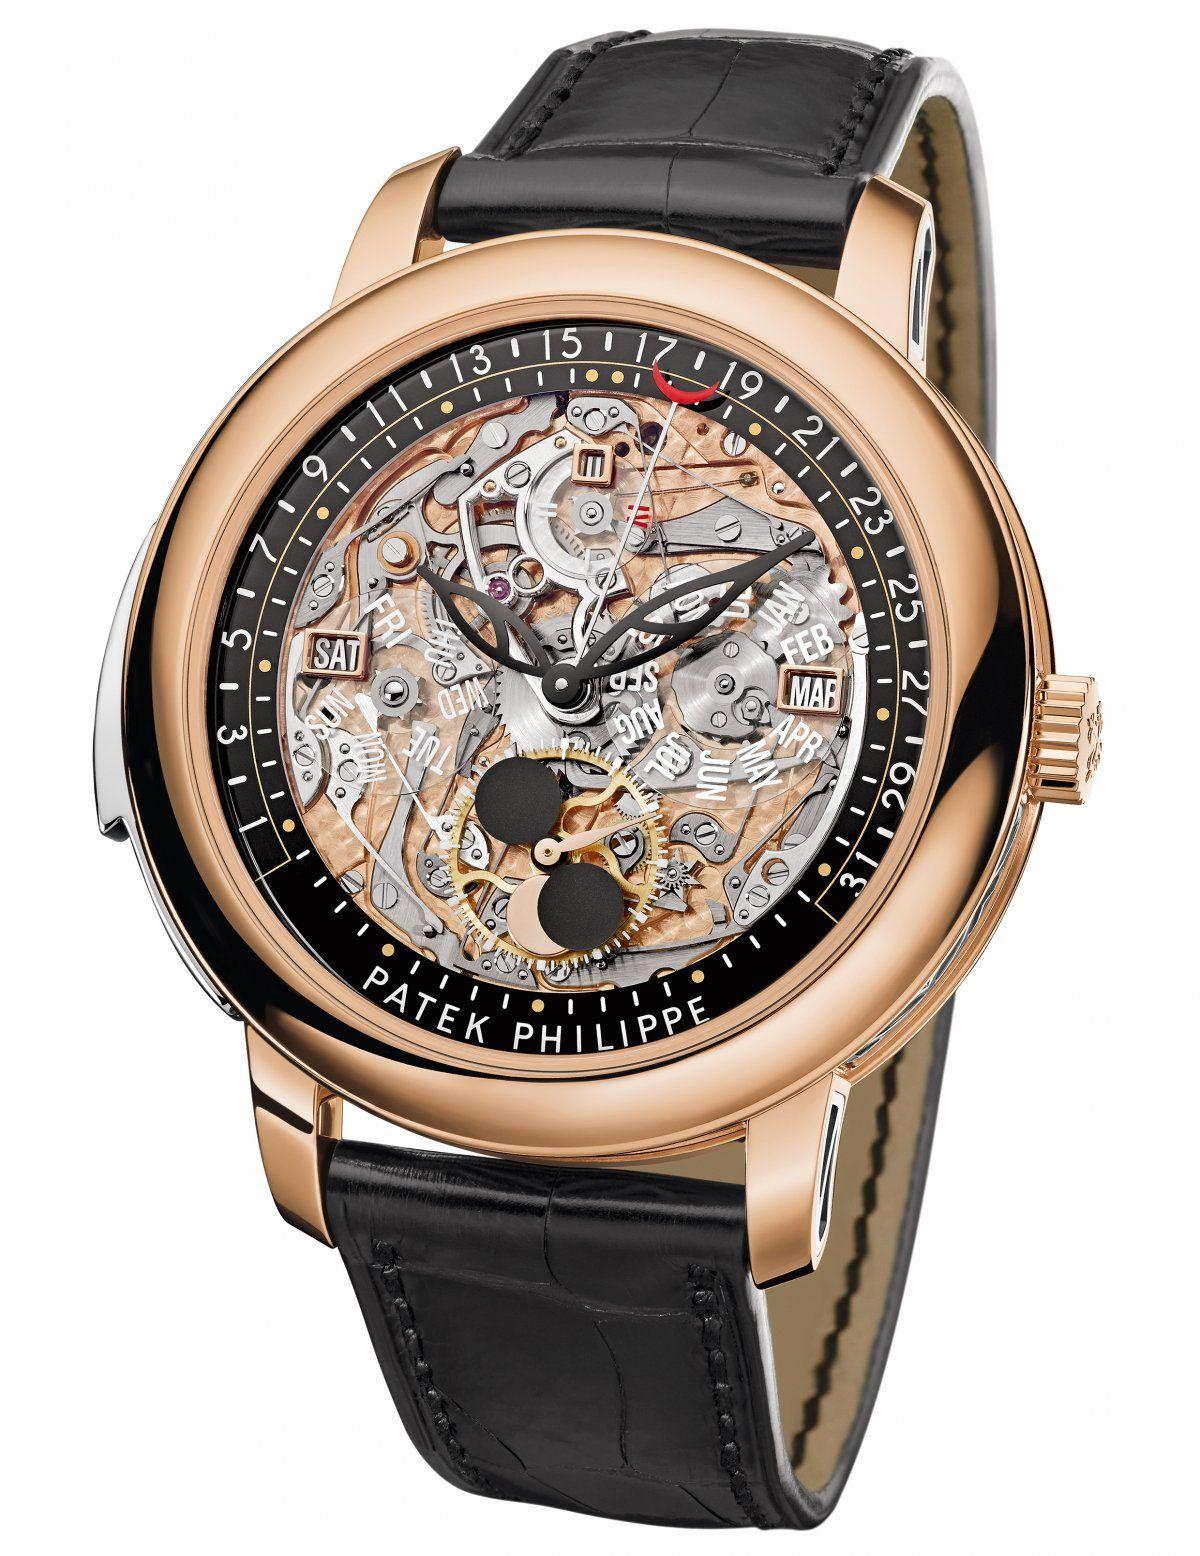 3f592e5ea1d Patek Philippe Grand Complication 5304 R27 - Watchonista